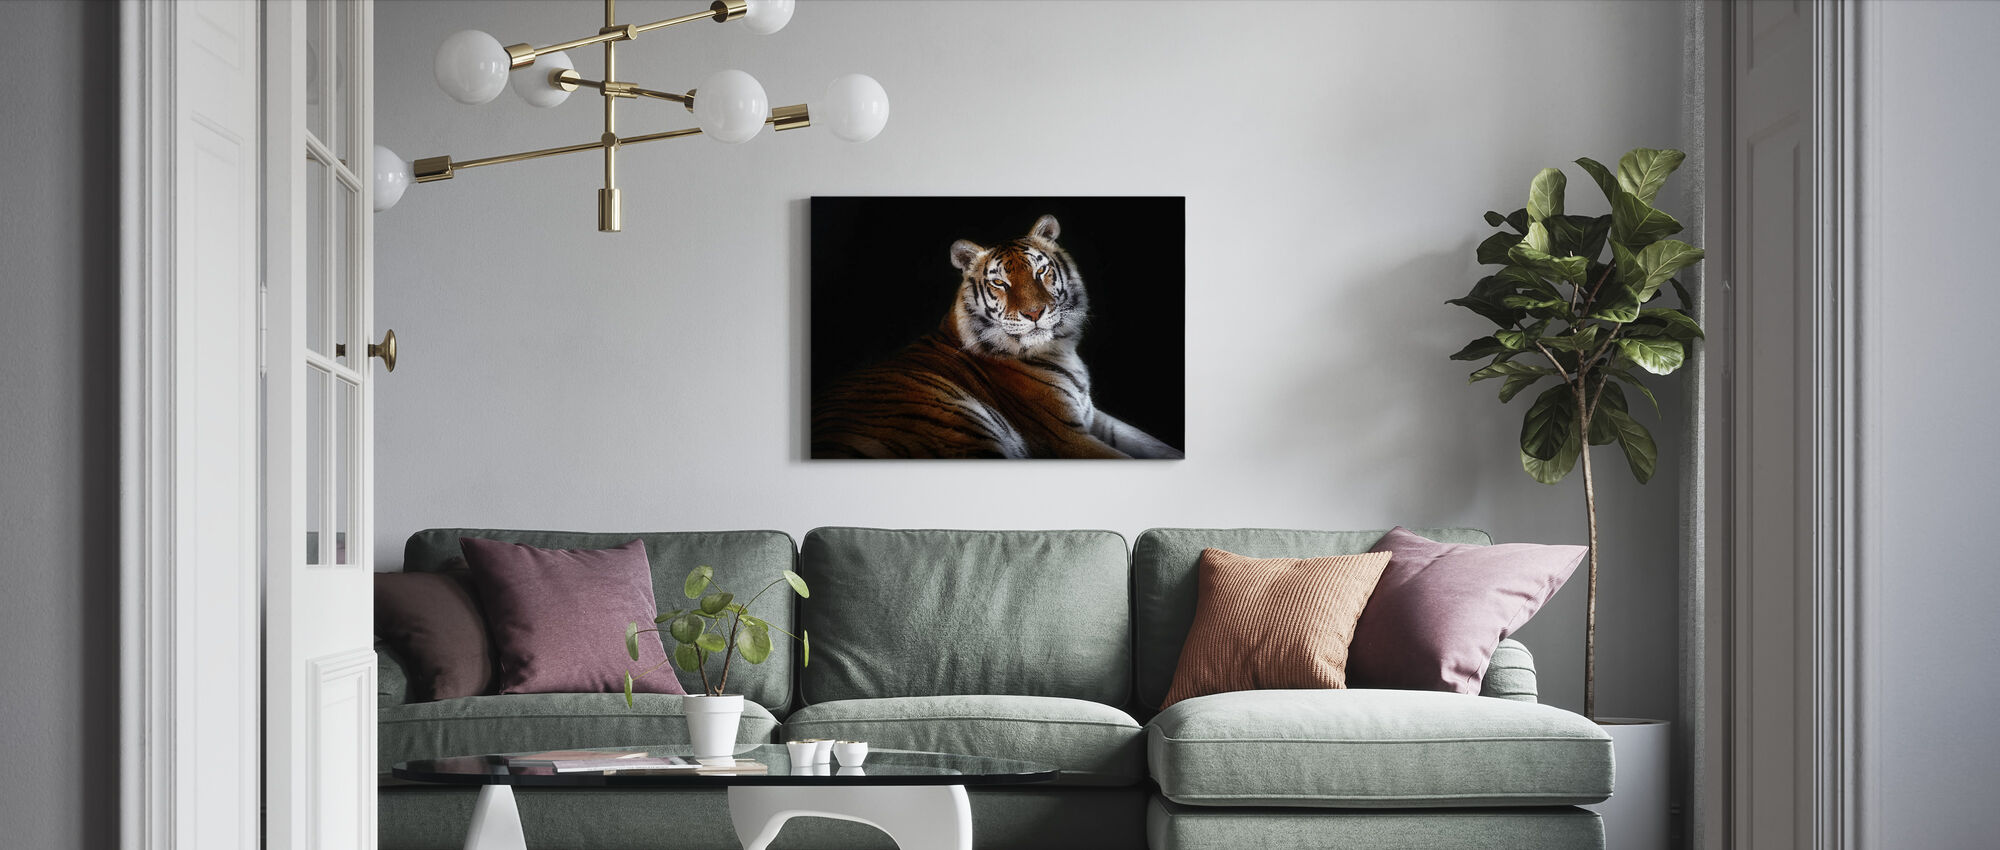 Serenity - Canvas print - Living Room